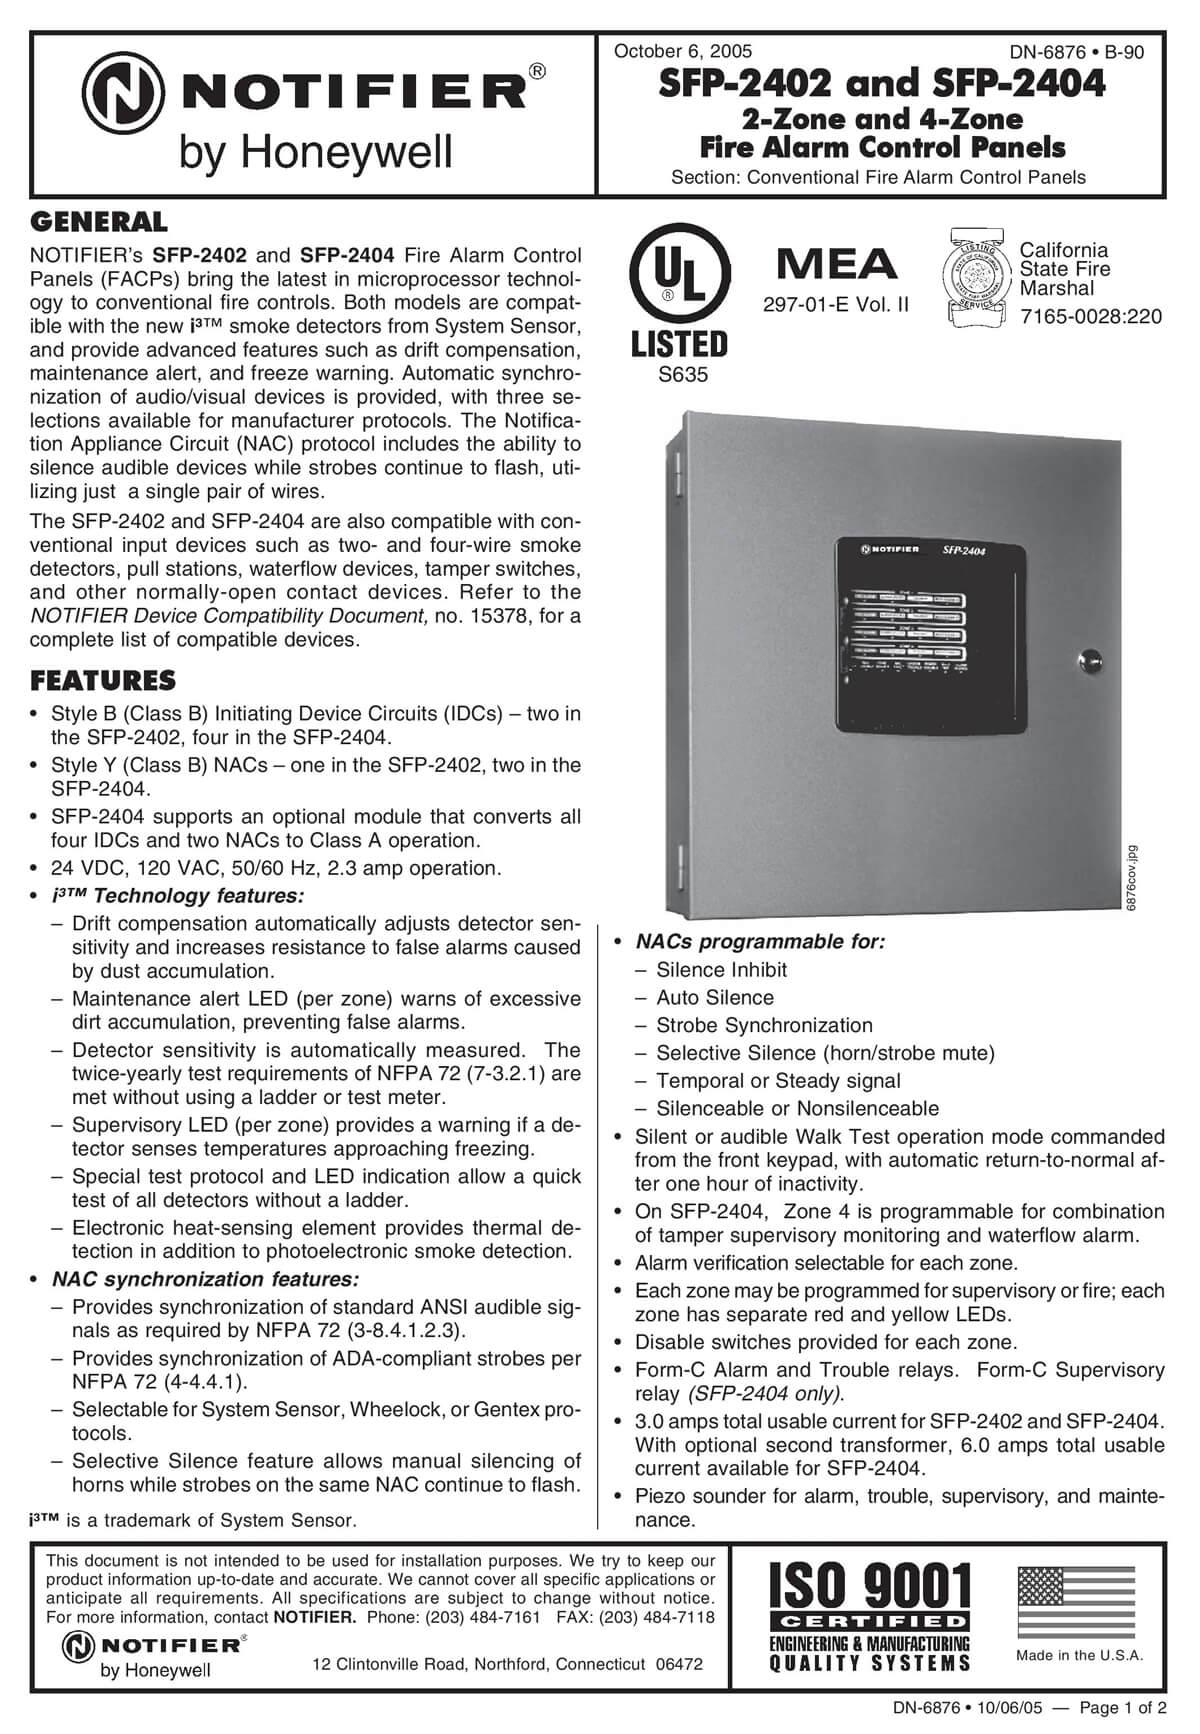 2-Zone Fire Alarm Control Panels SFP-2402